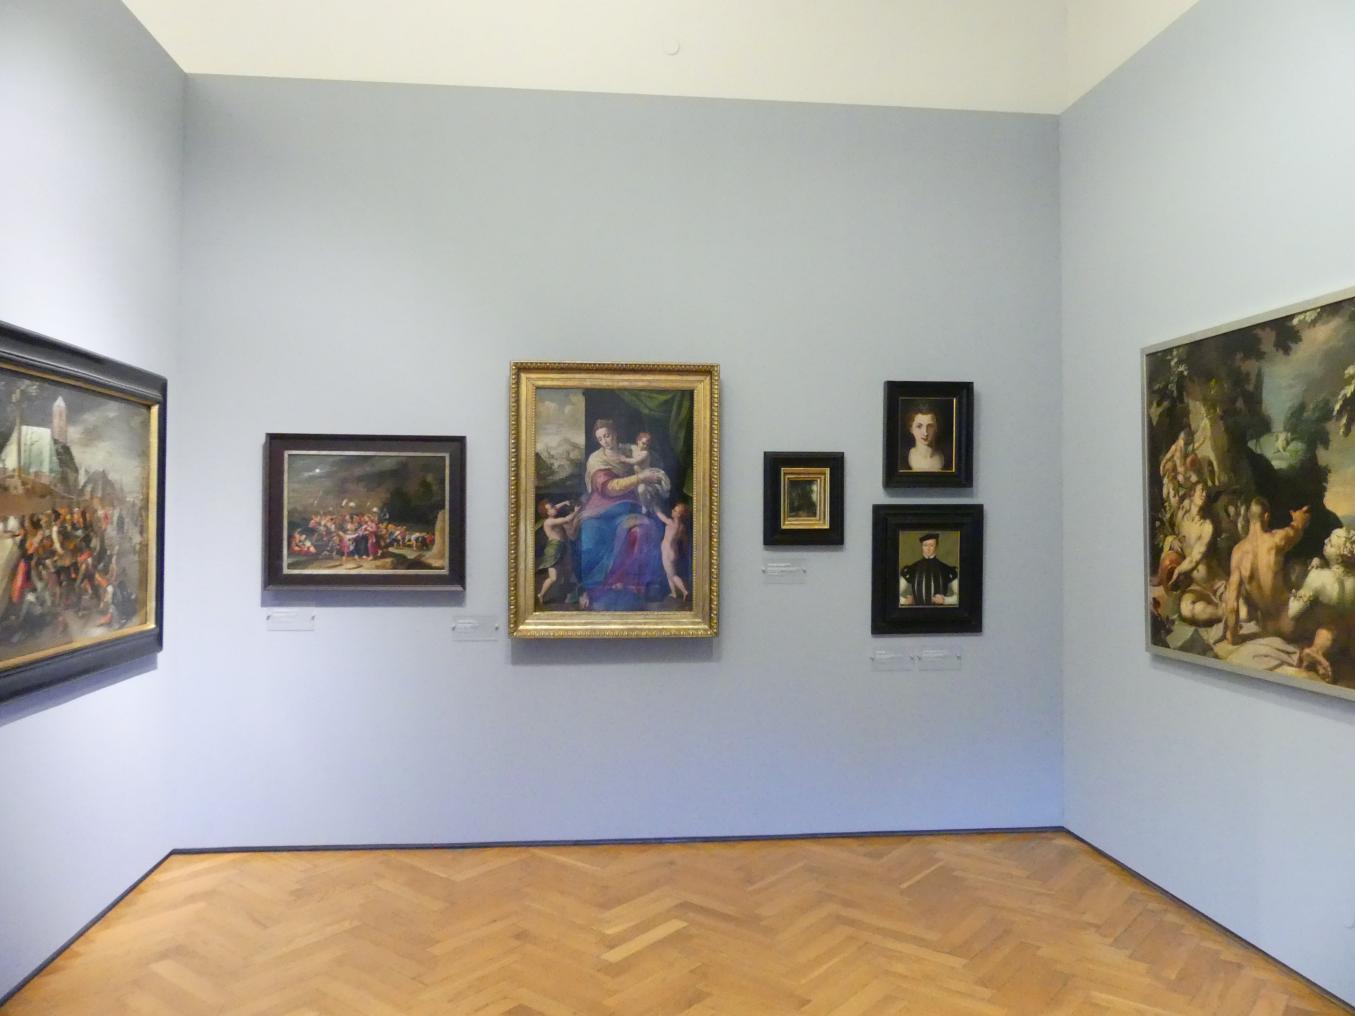 Breslau, Nationalmuseum, 2. OG, europäische Kunst 15.-20. Jhd., Saal 4